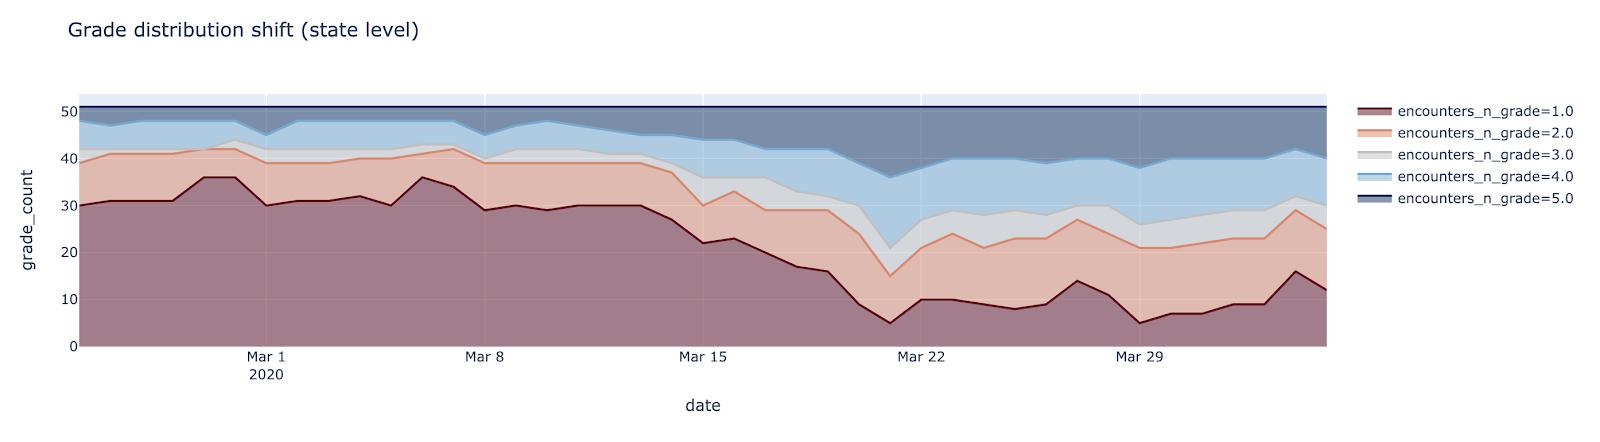 grade distribution shift